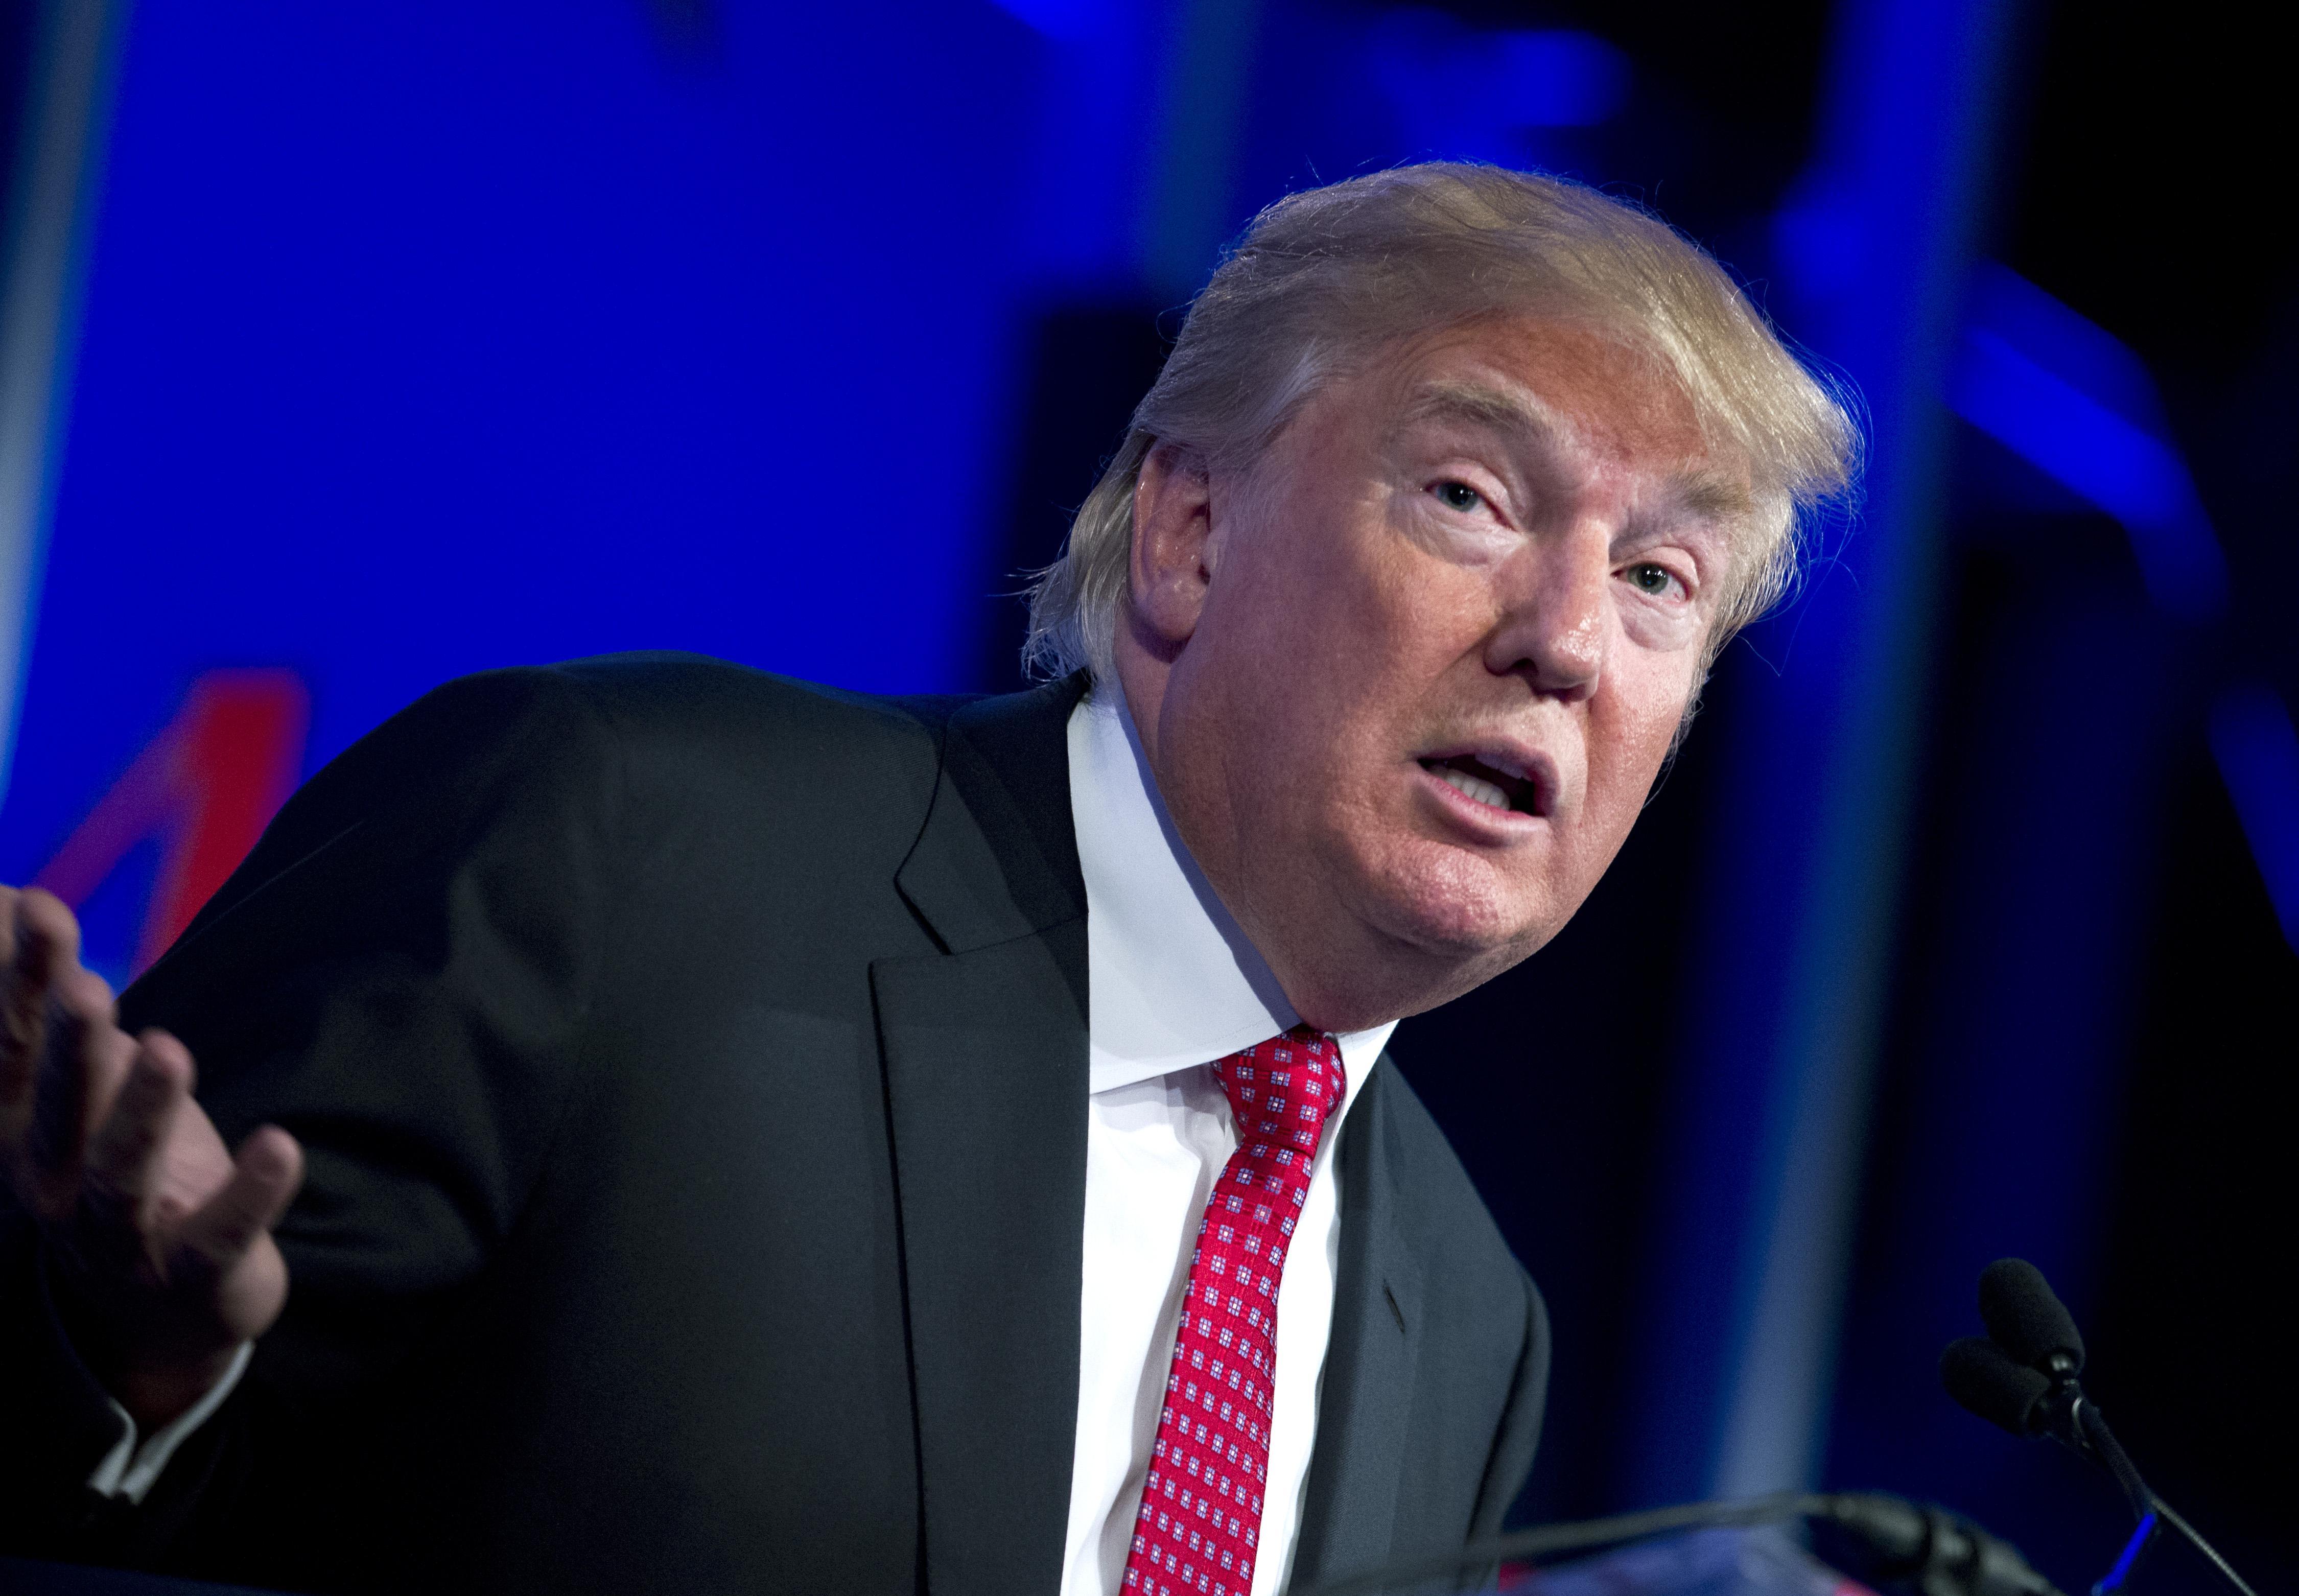 Should NAFTA be repealed?